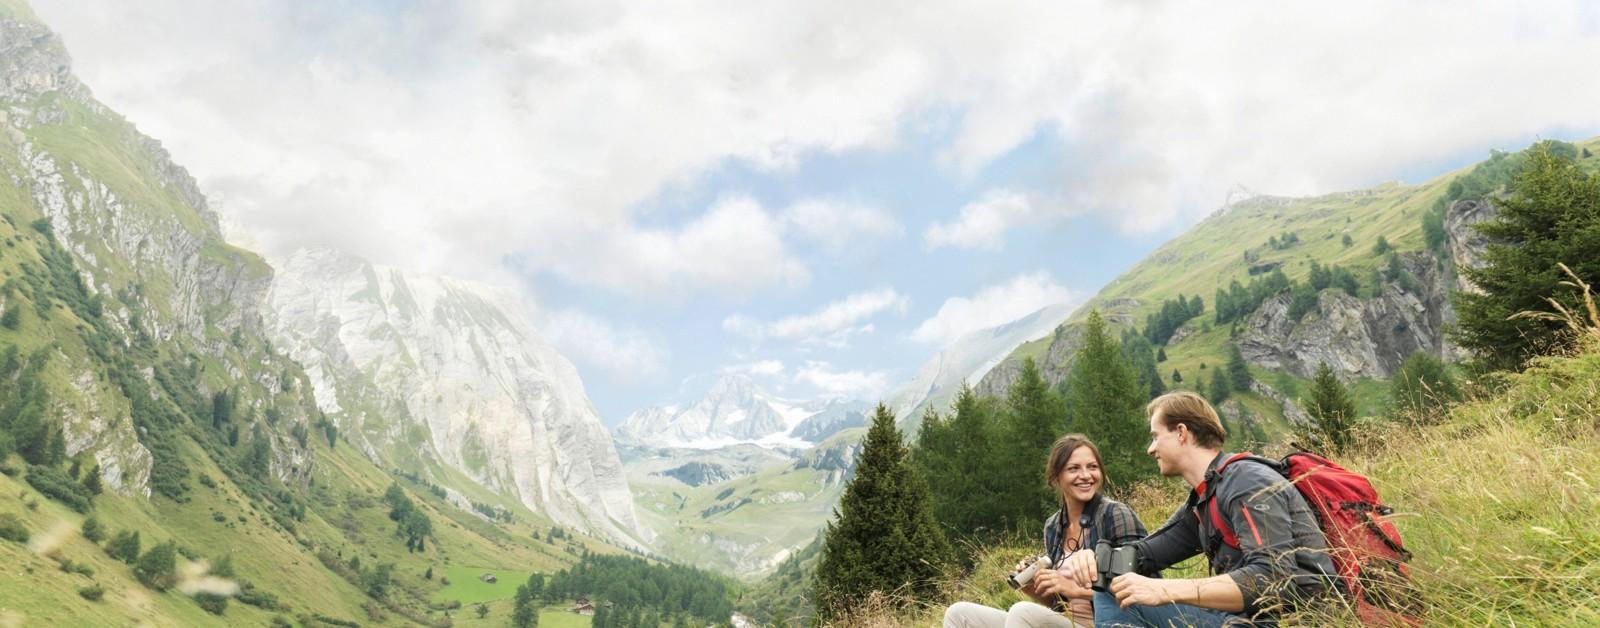 (c) Austria.info